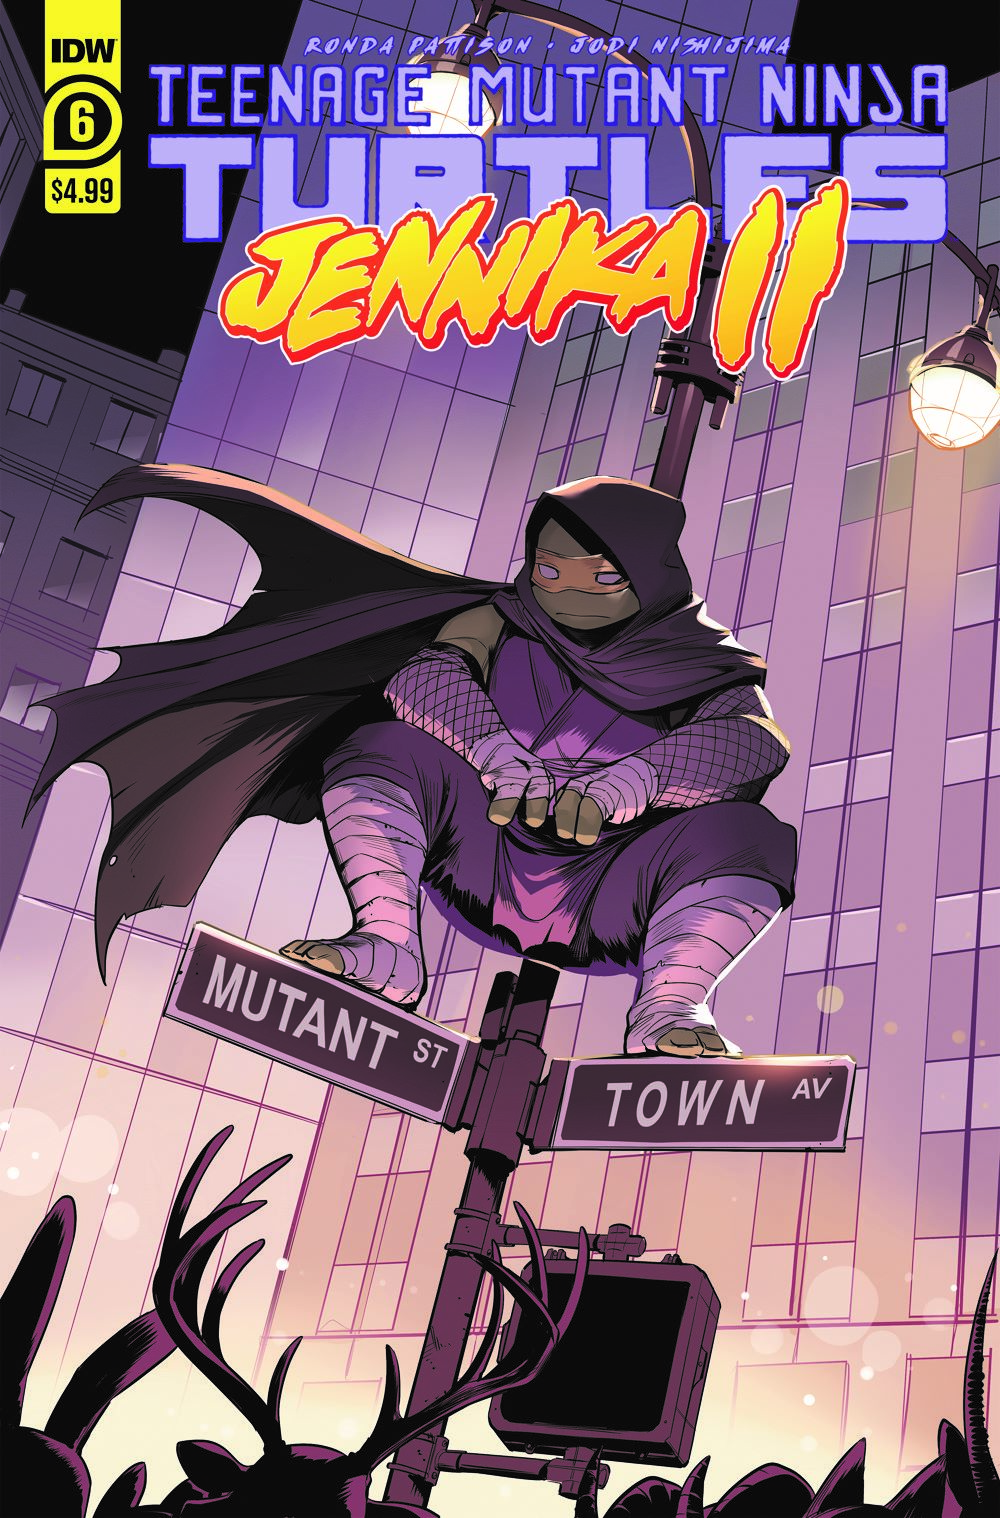 TMNT-Jennik ComicList: IDW Publishing New Releases for 04/14/2021